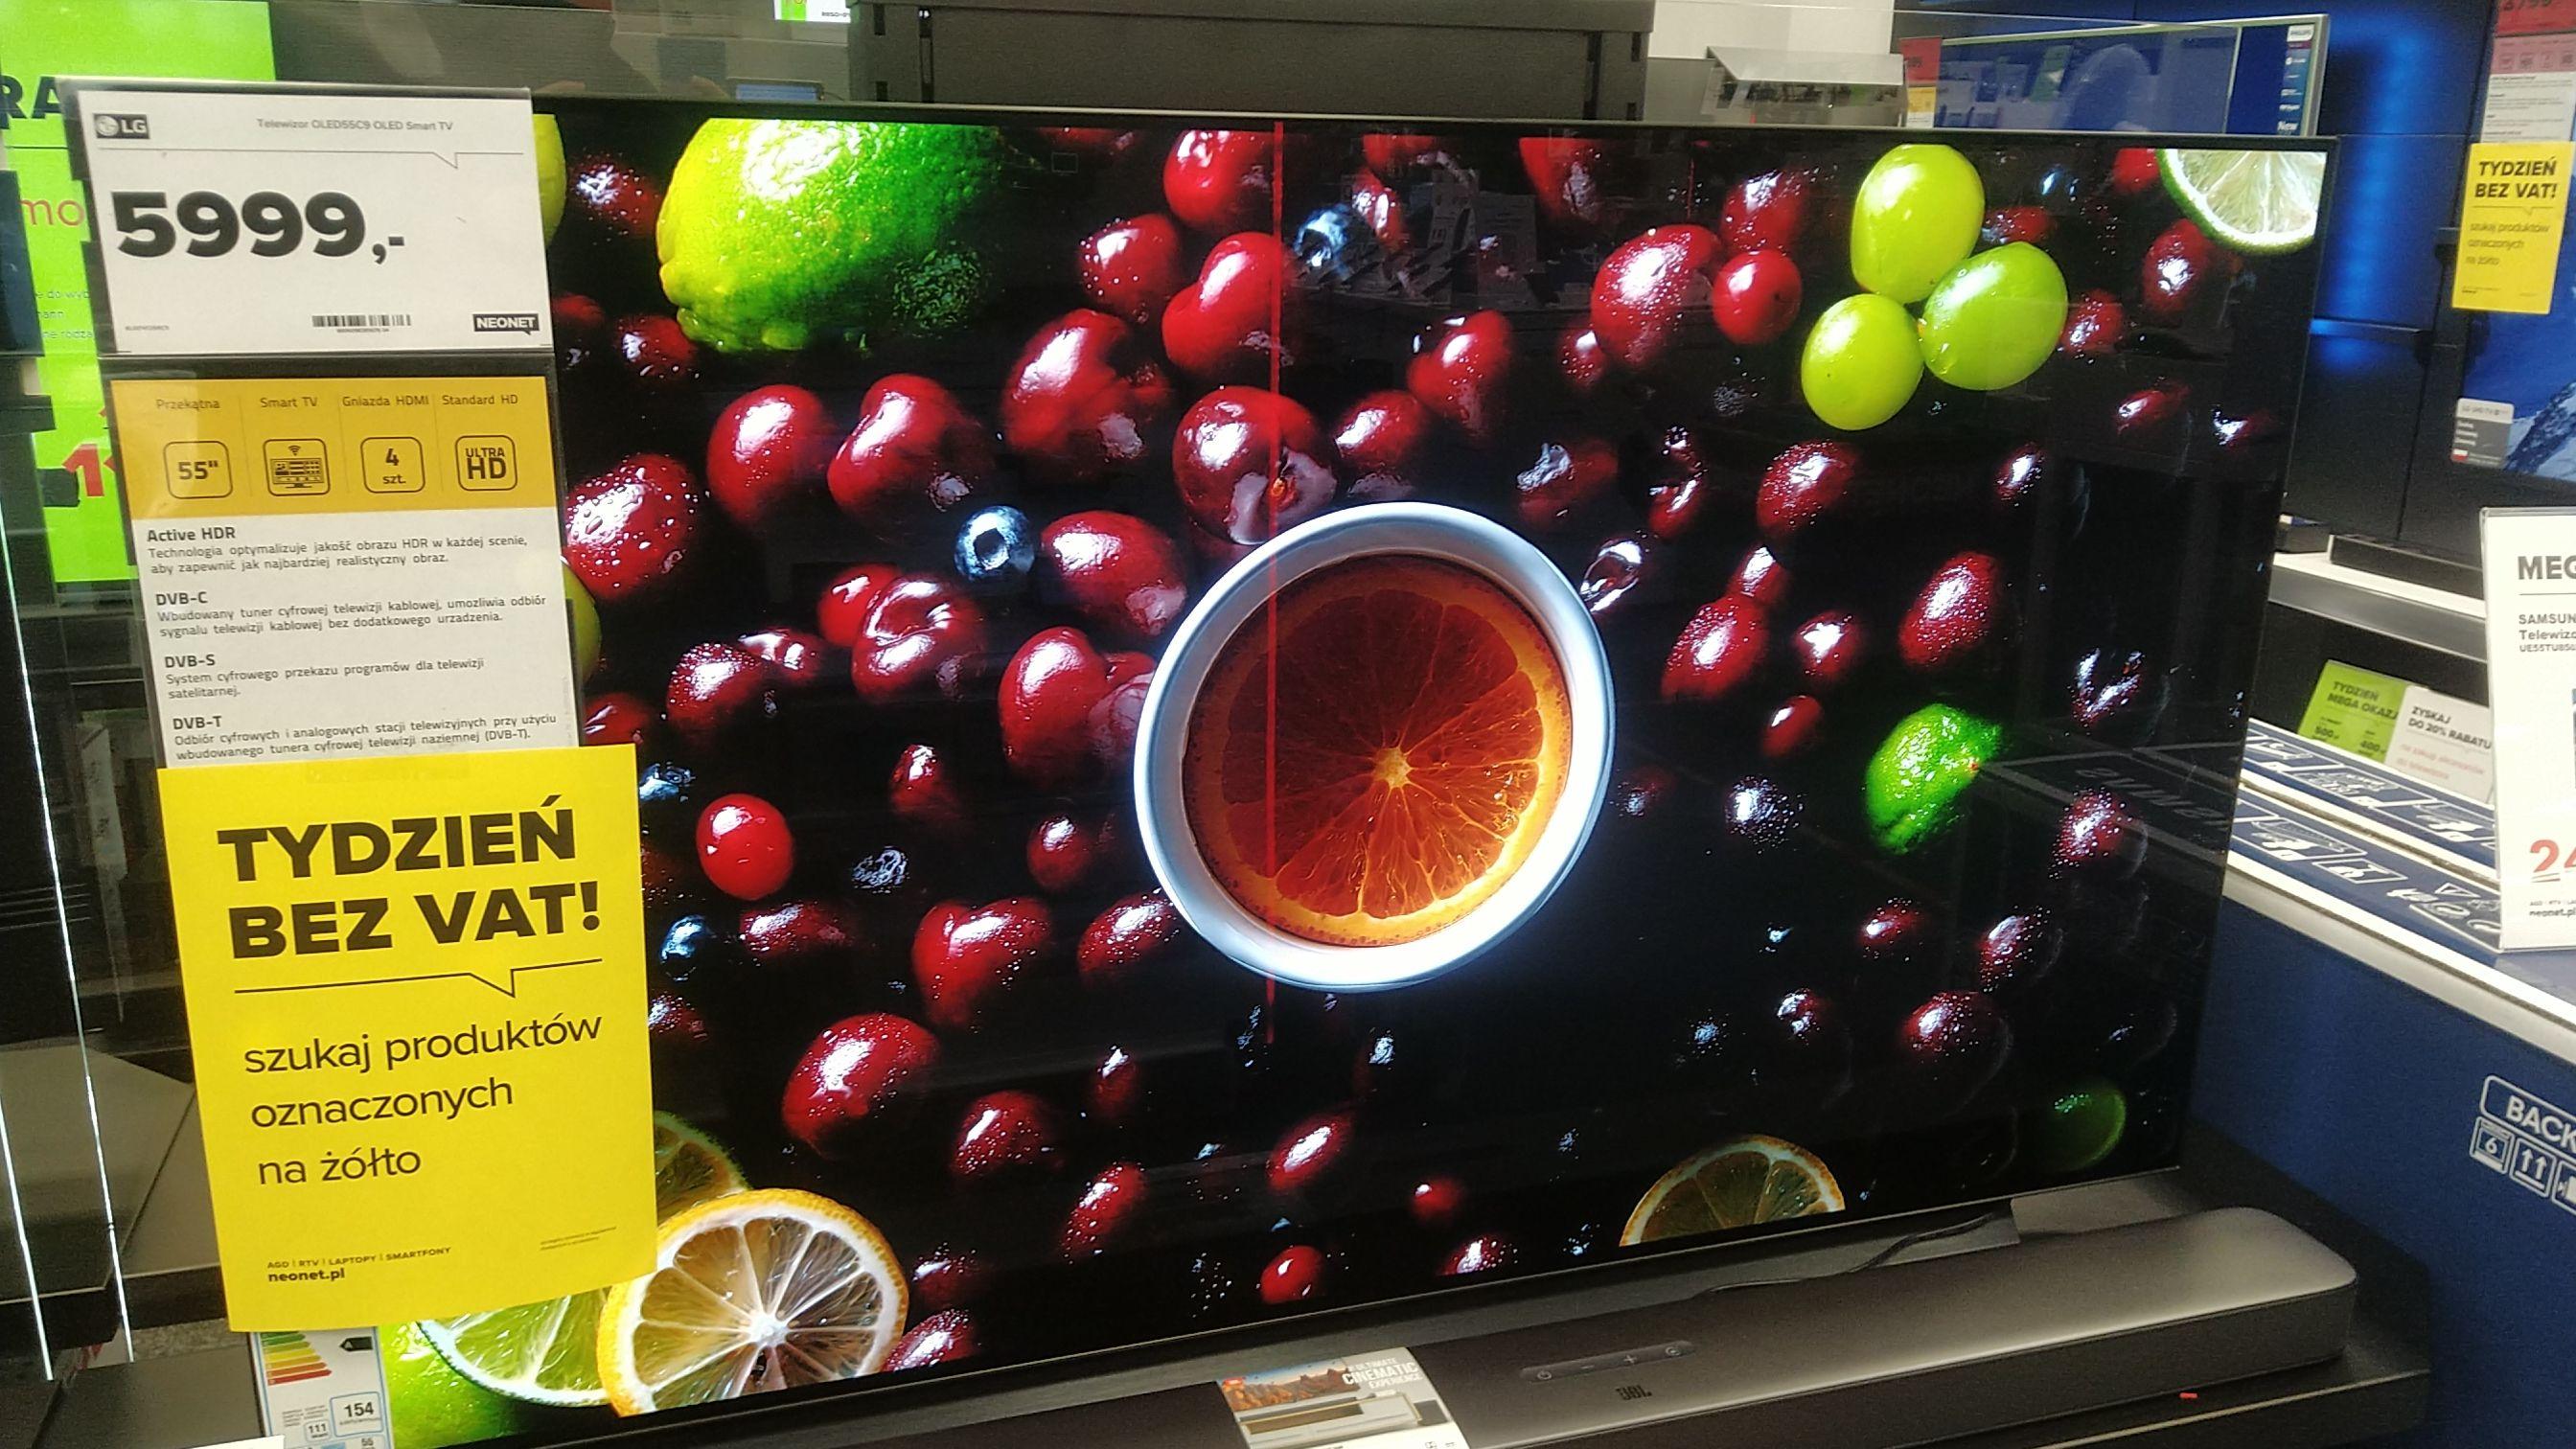 Telewizor LG OLED55C9 OLED Smart TV Neonet Lubliniec tydzień bez vat